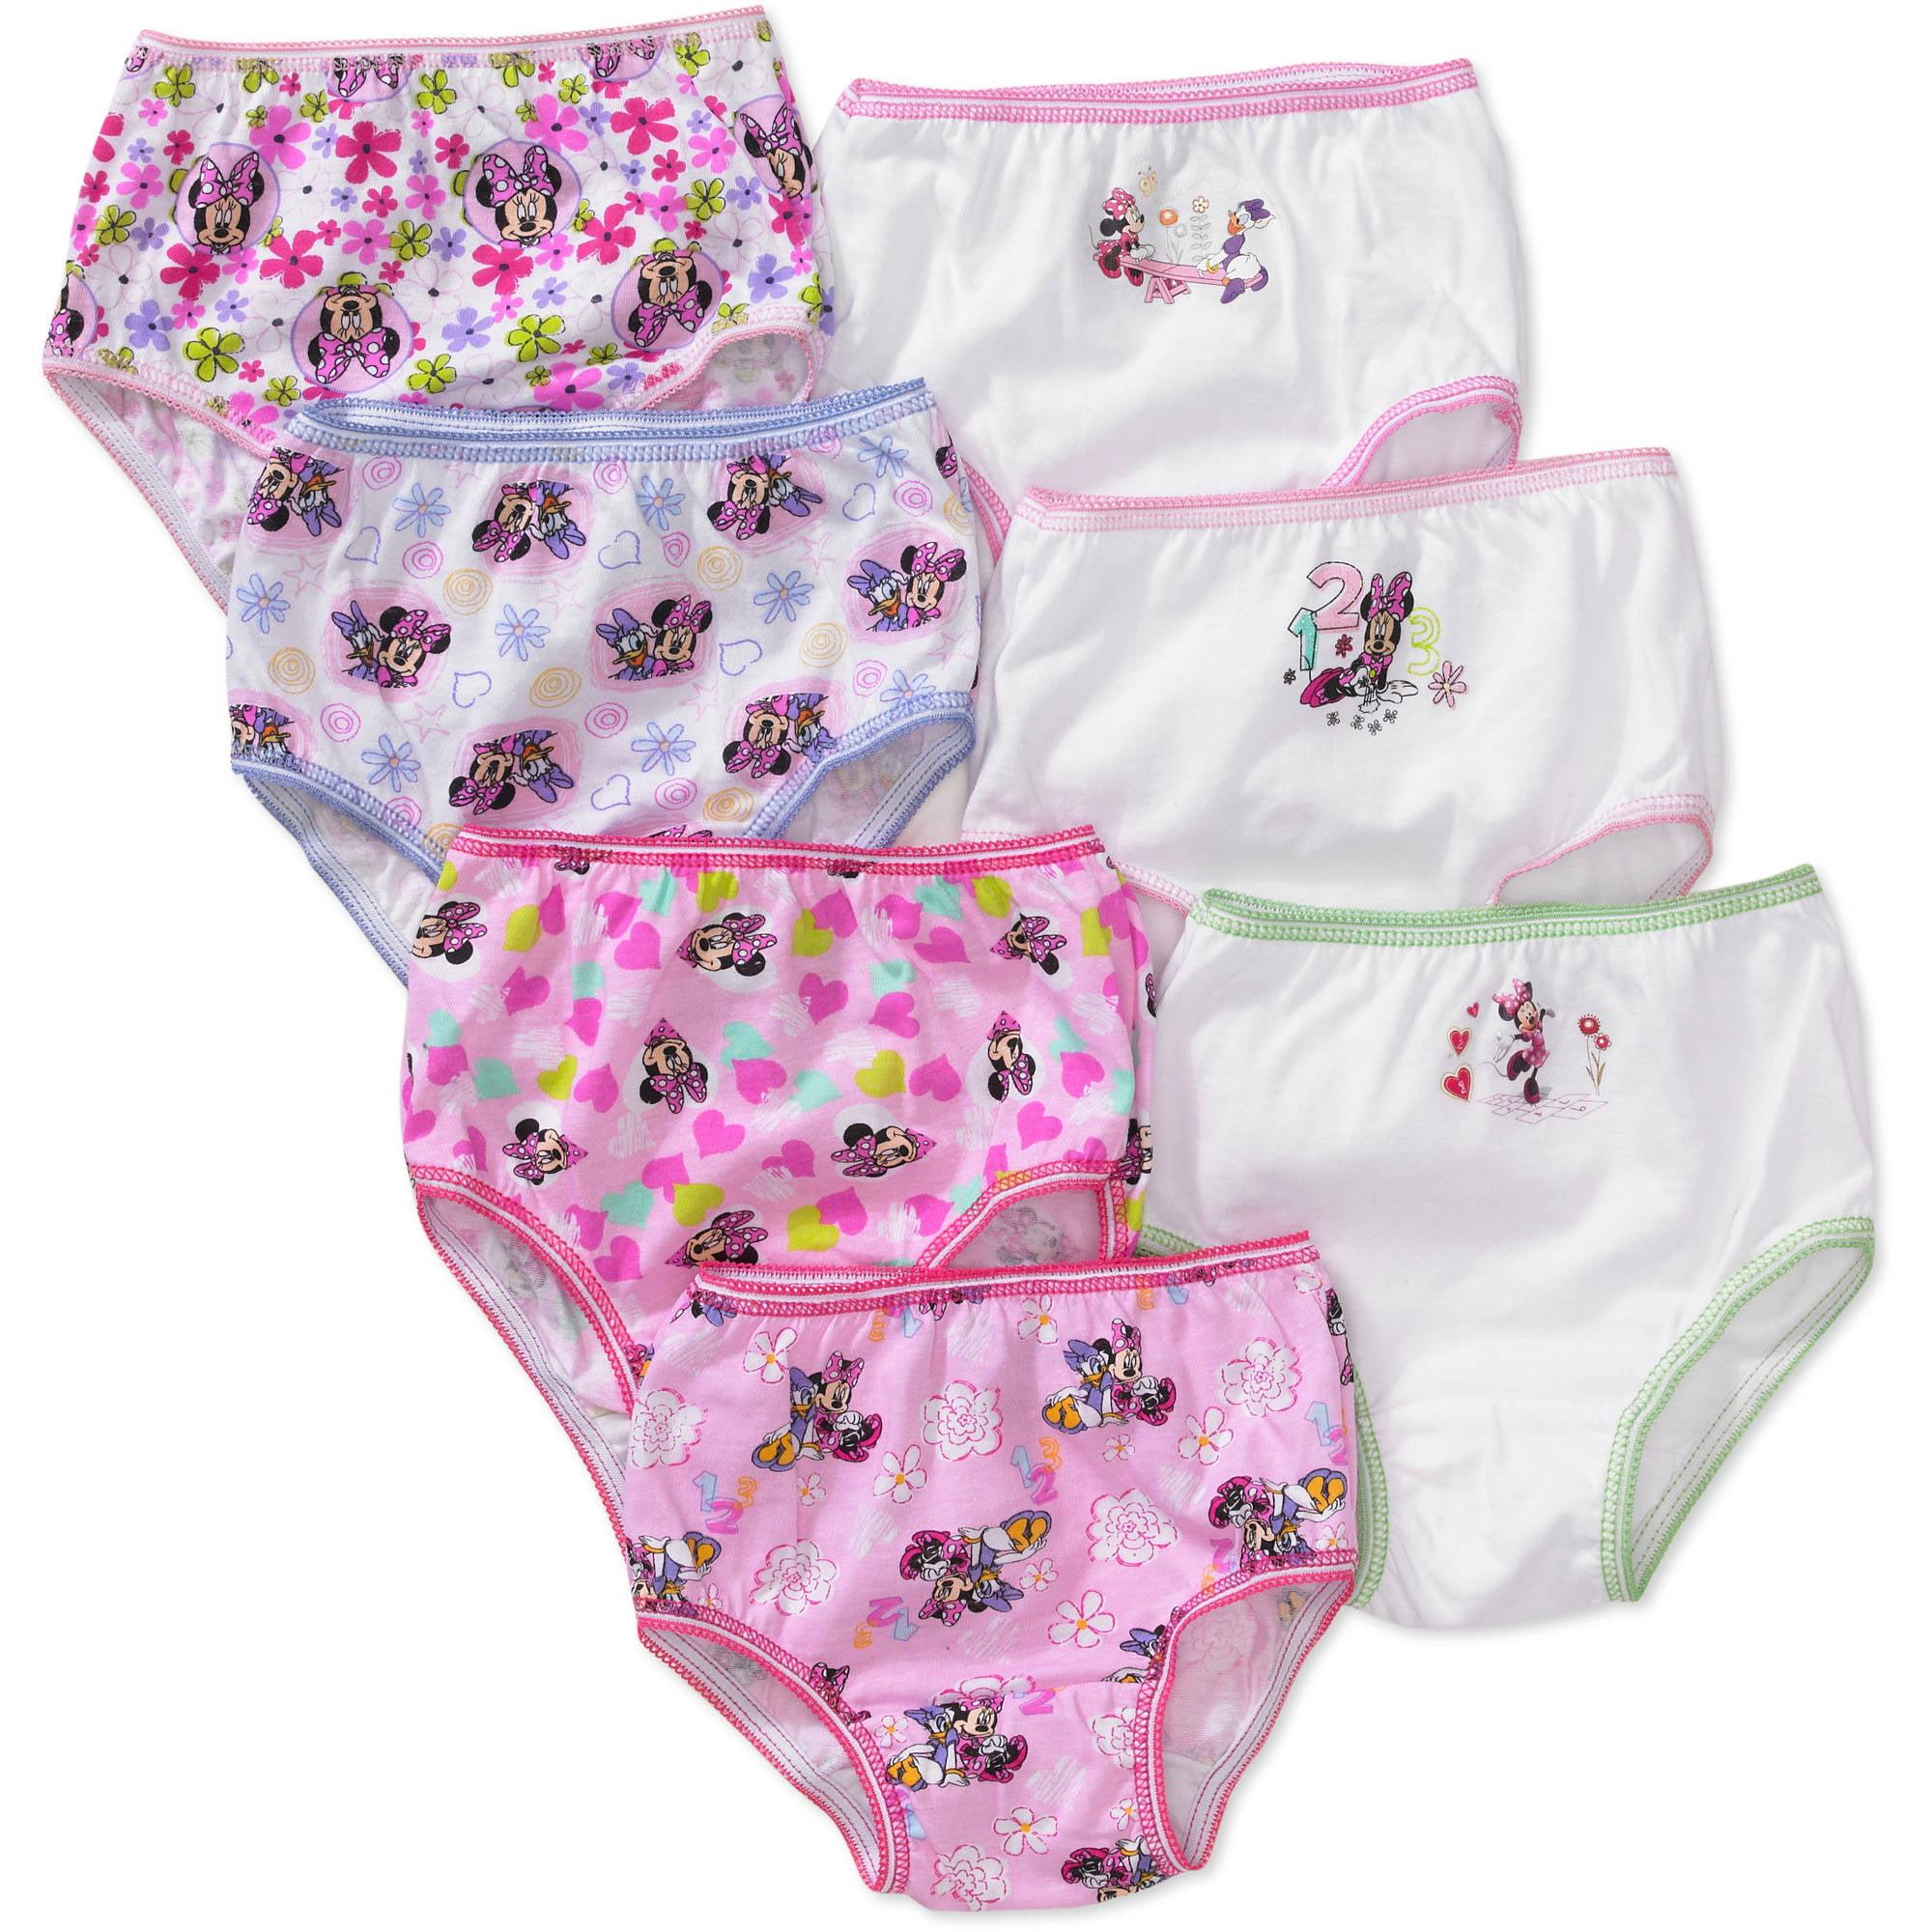 Disney Toddler Girl Minnie Mouse Underwear, 7-Pack